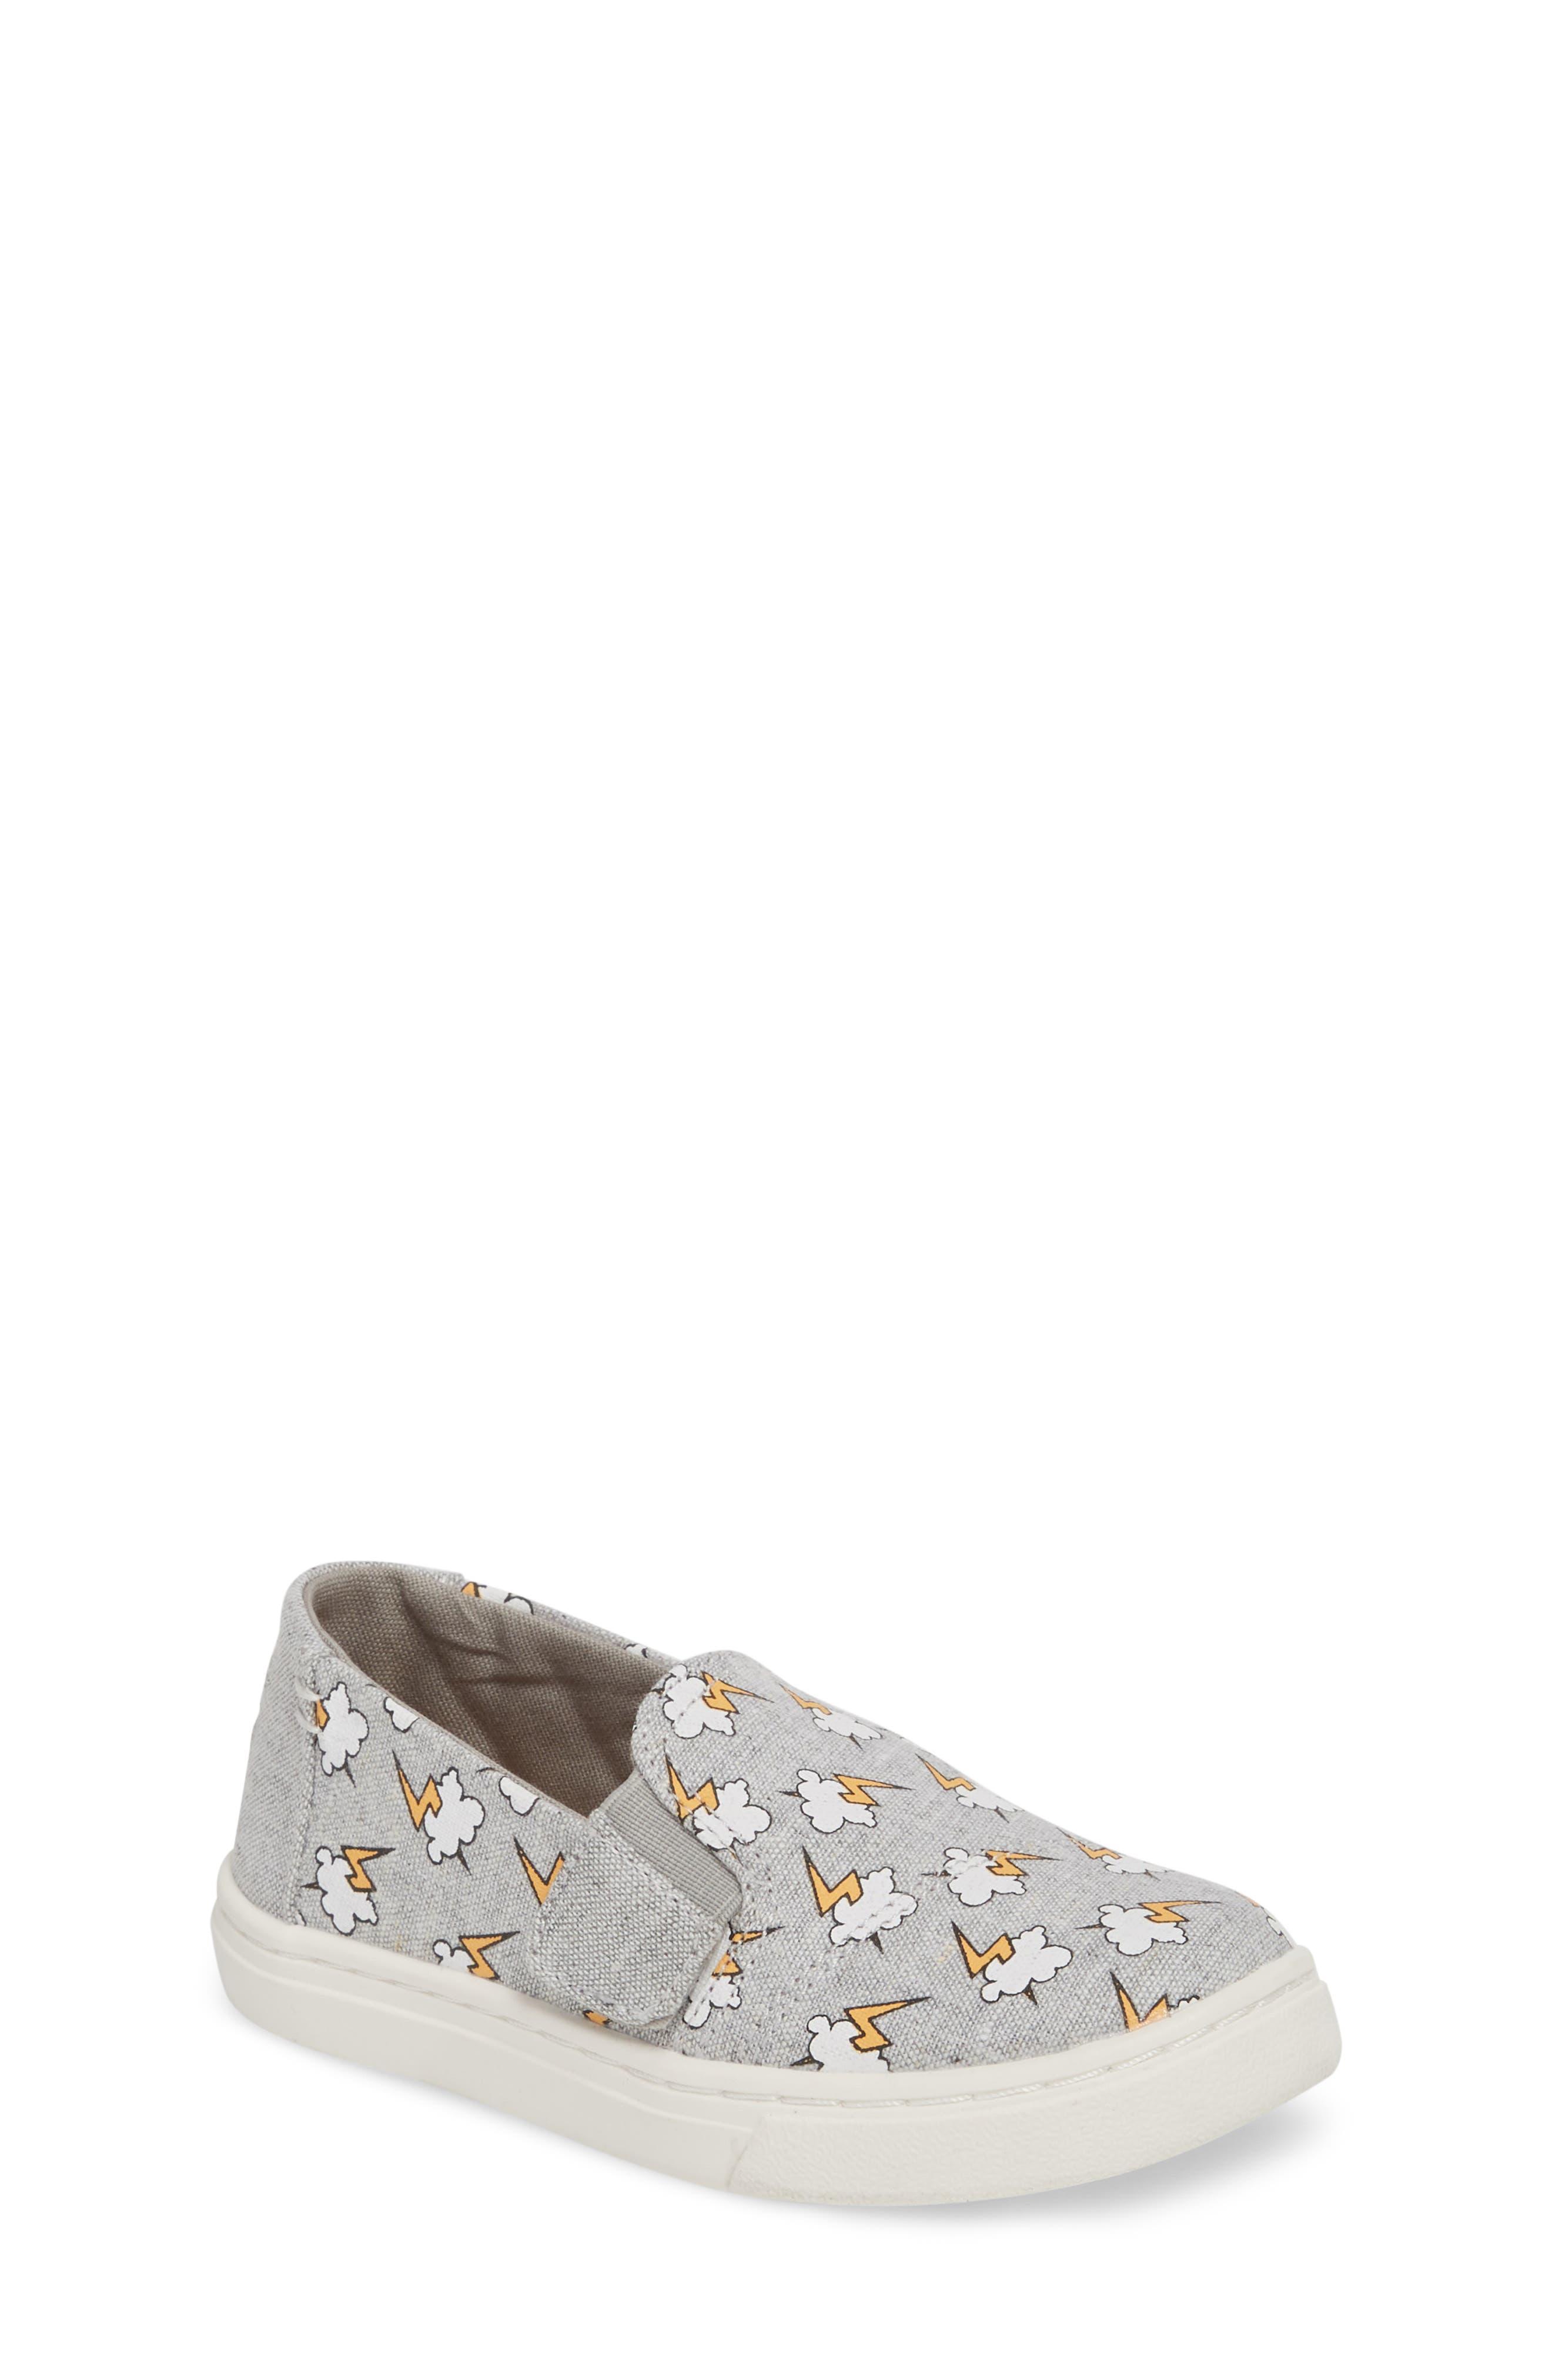 Luca Slip-On Sneaker,                         Main,                         color, DRIZZLE GREY LIGHTNING BOLT